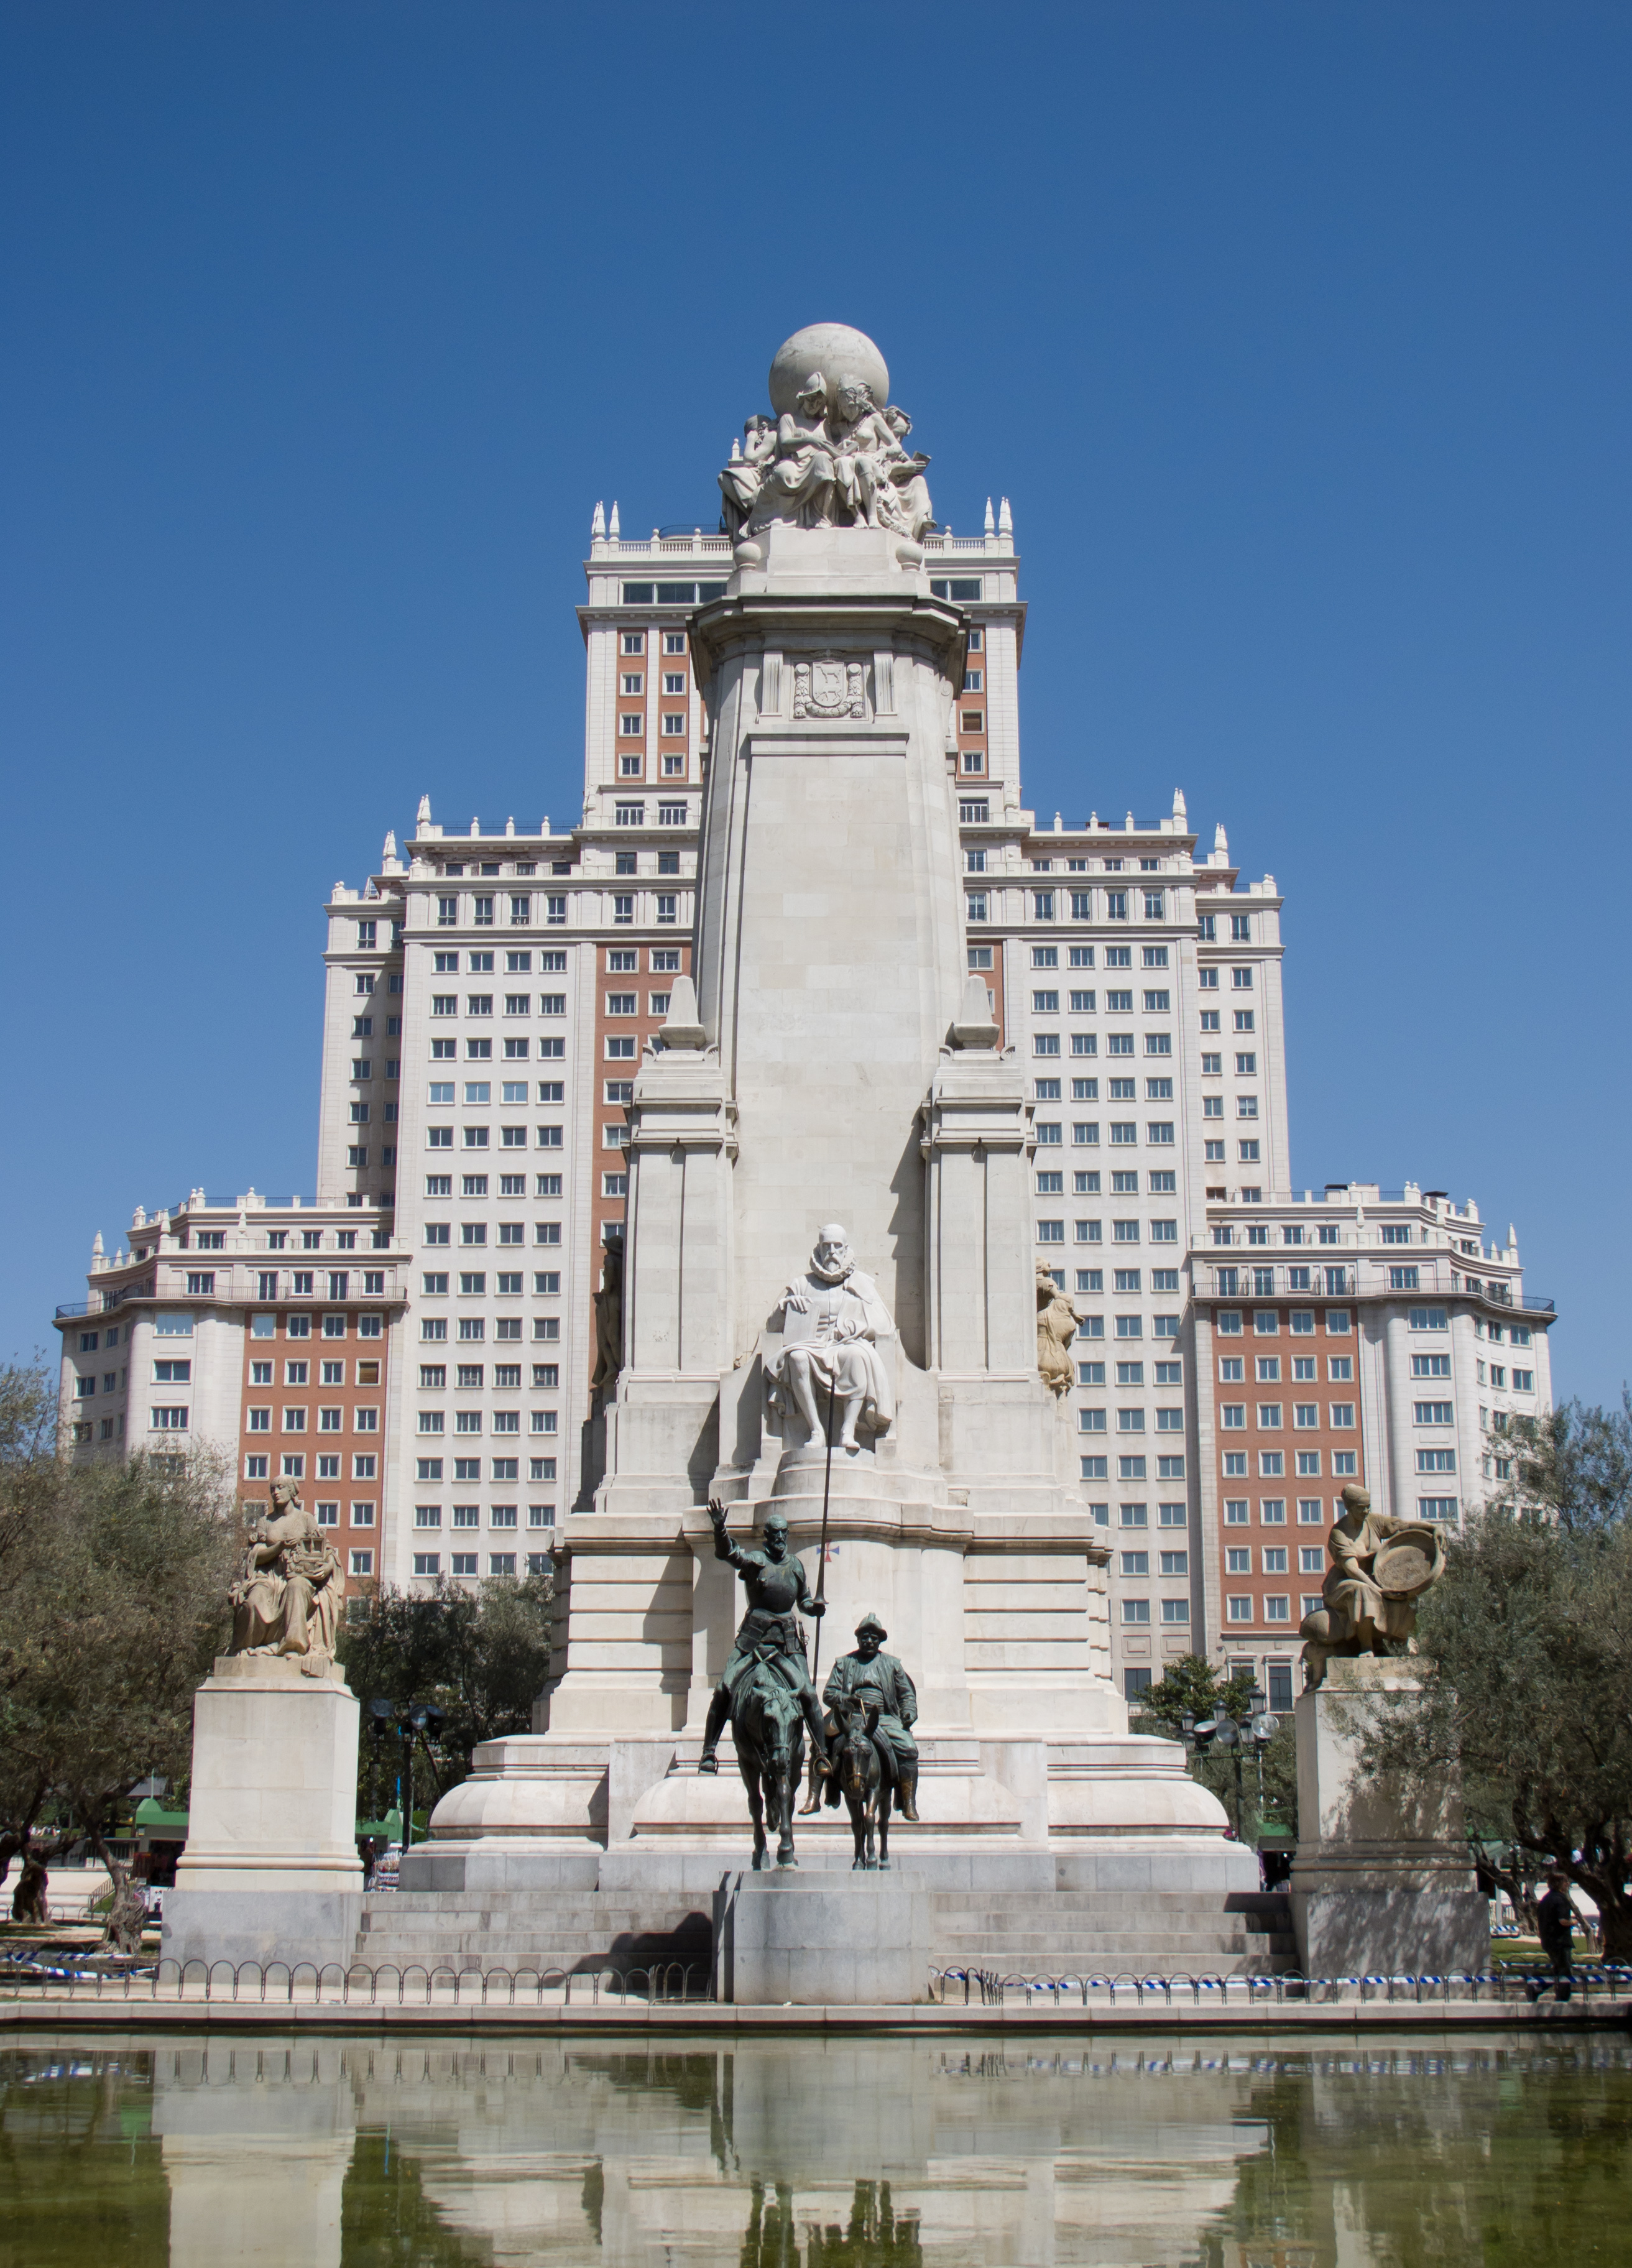 Памятник Мигелю Сервантесу в Мадриде на площади Испании